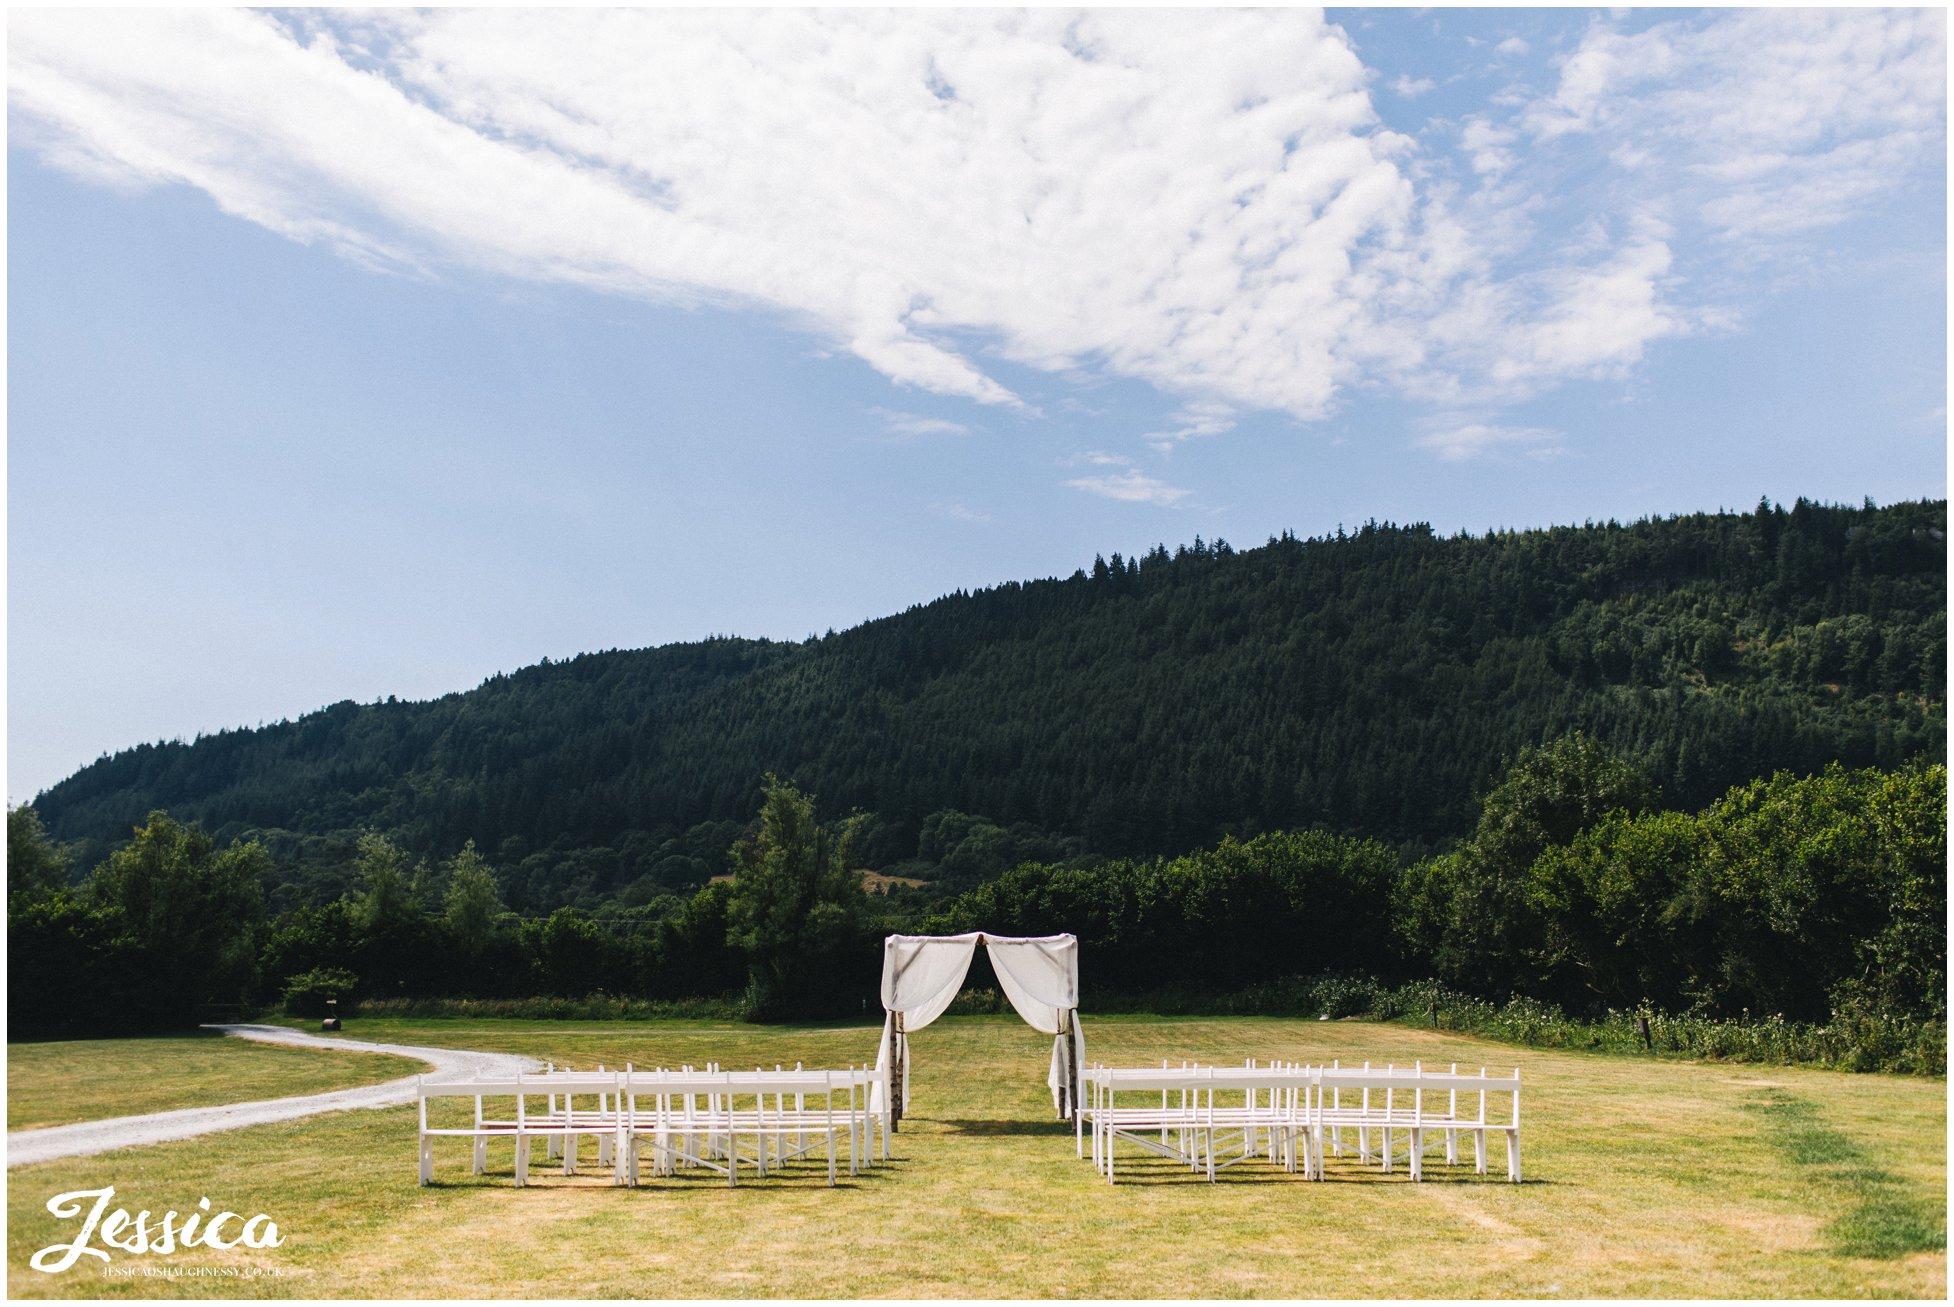 The chuppah set up ready for the outdoor wedding at hafod farm